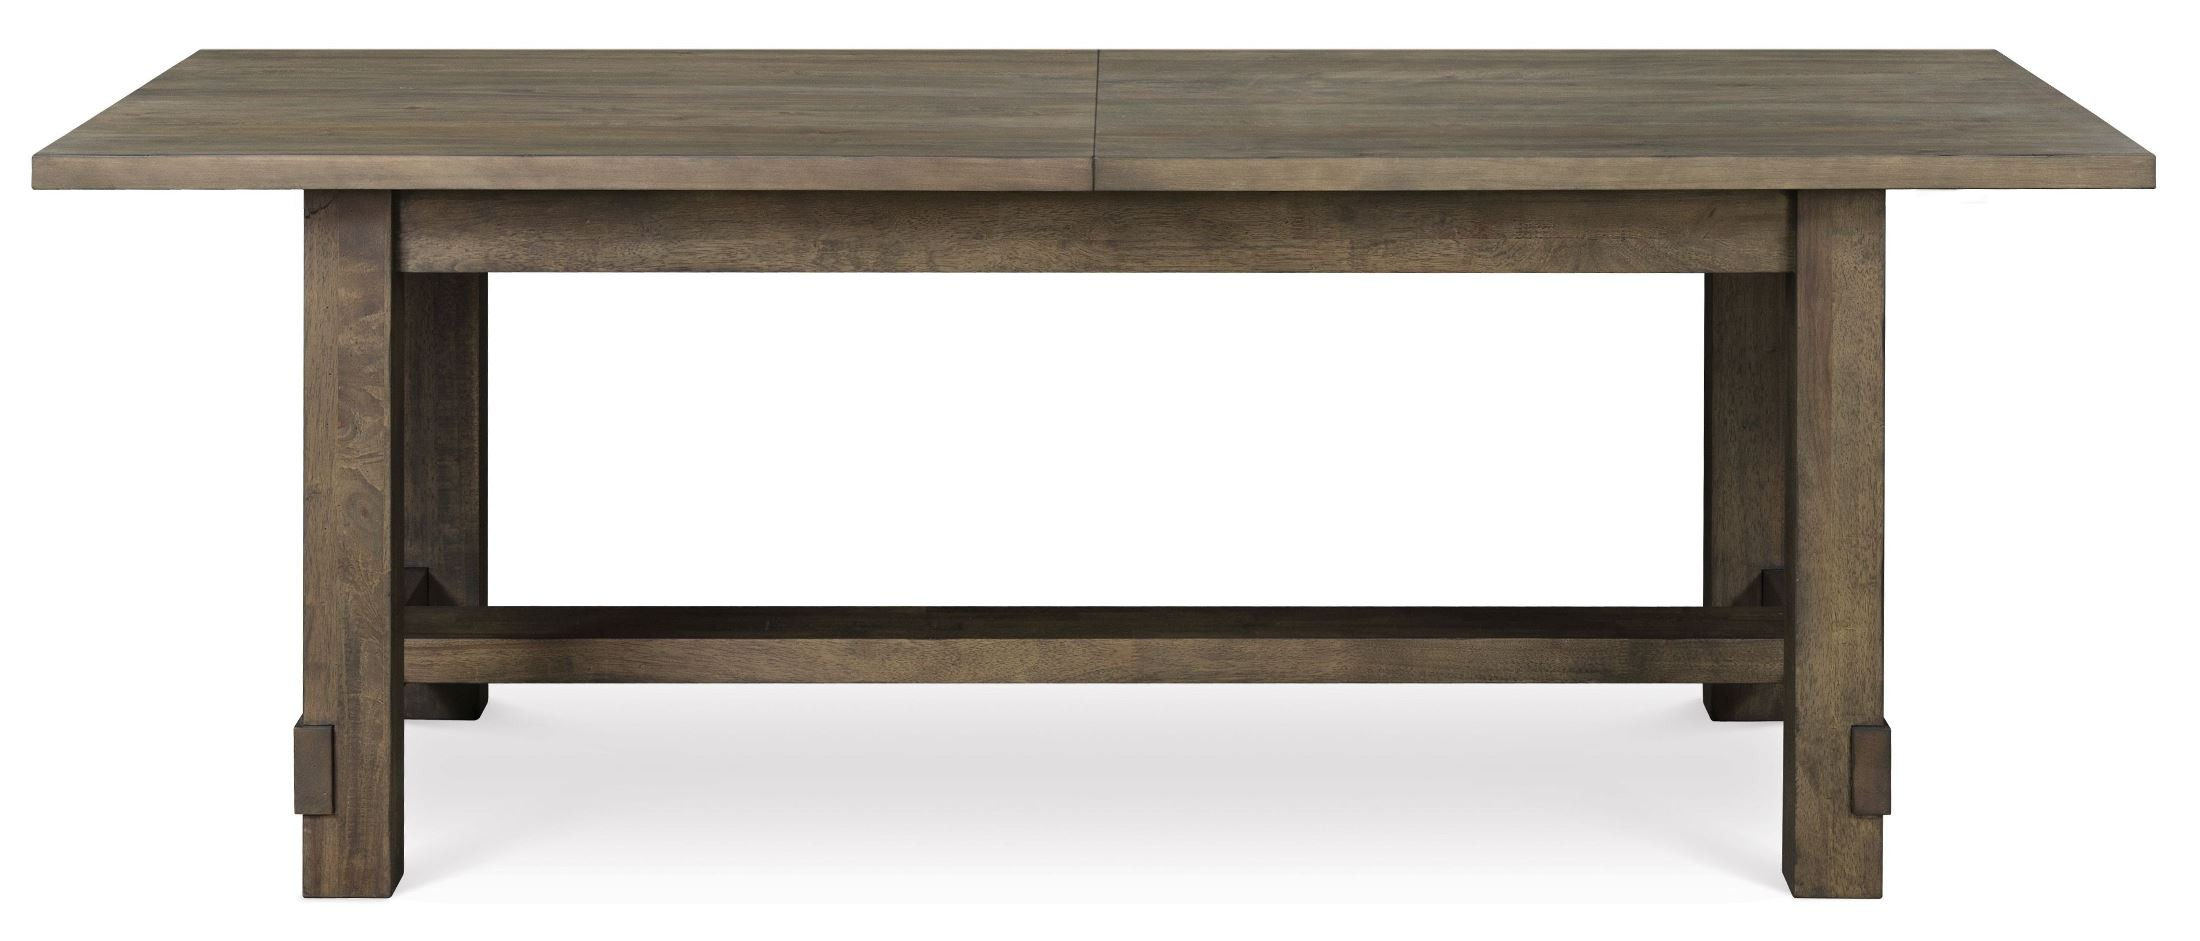 Karlin Rectangular Dining Room Set from Magnussen Home  : d2471 20 f from colemanfurniture.com size 2200 x 941 jpeg 177kB